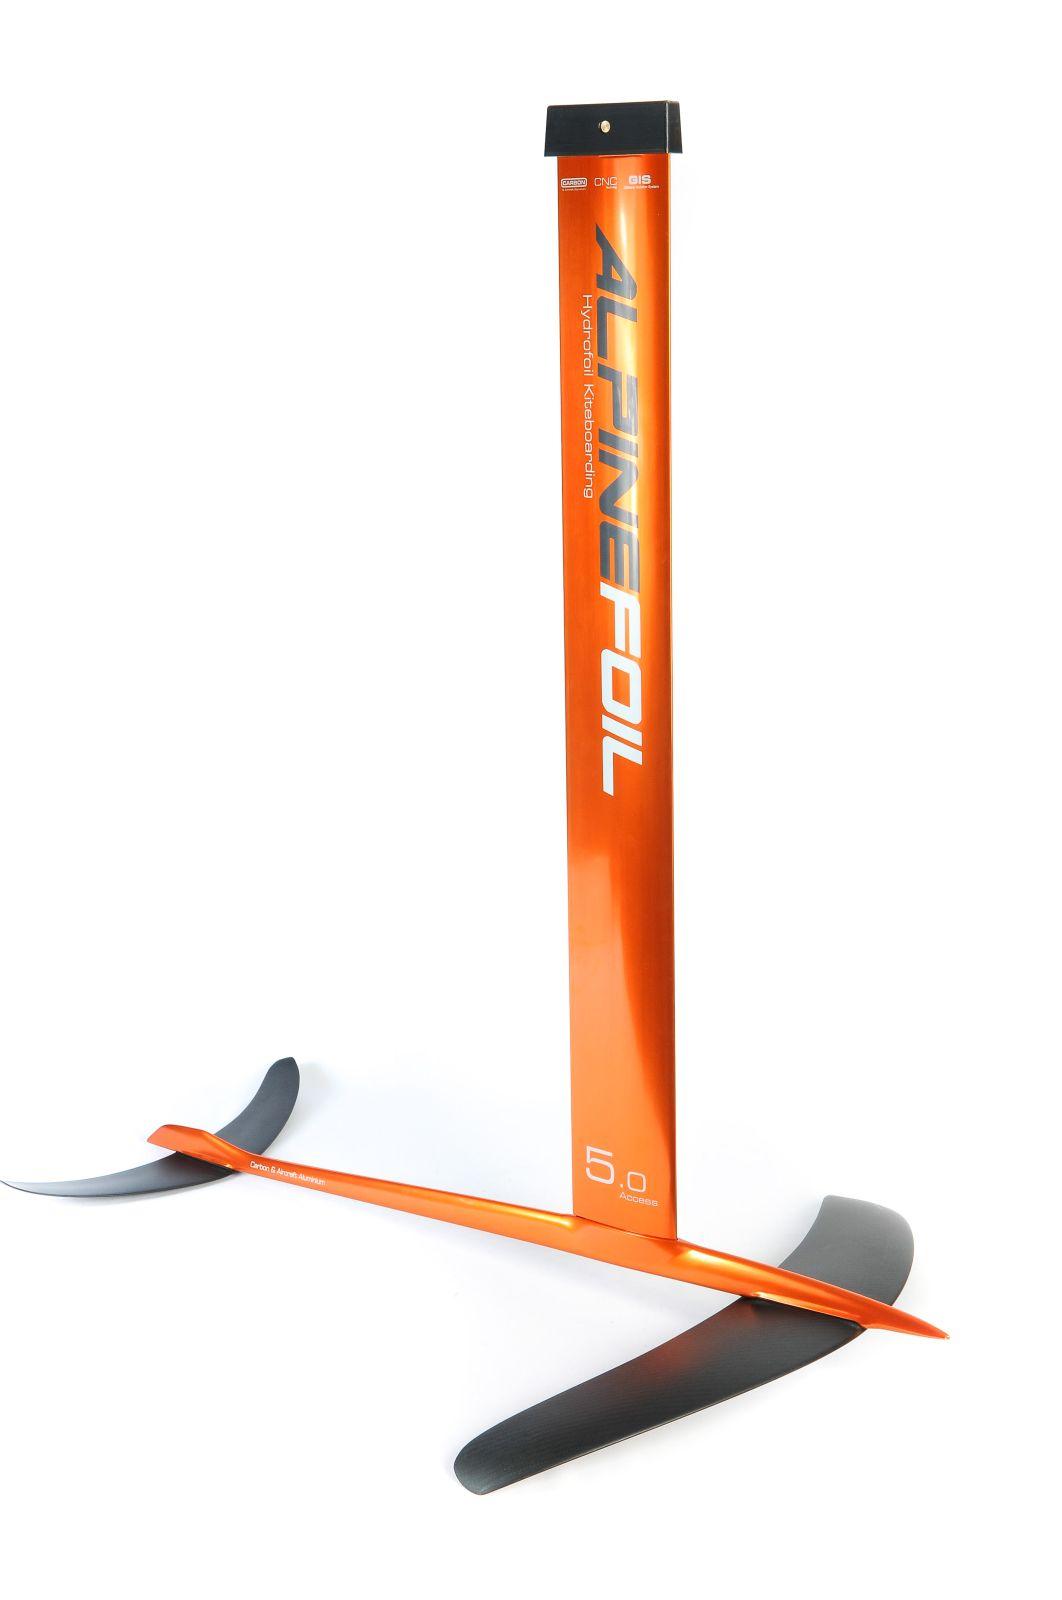 Kitefoil carbon aluminium alpinefoil 5 0 access v2 3326 1